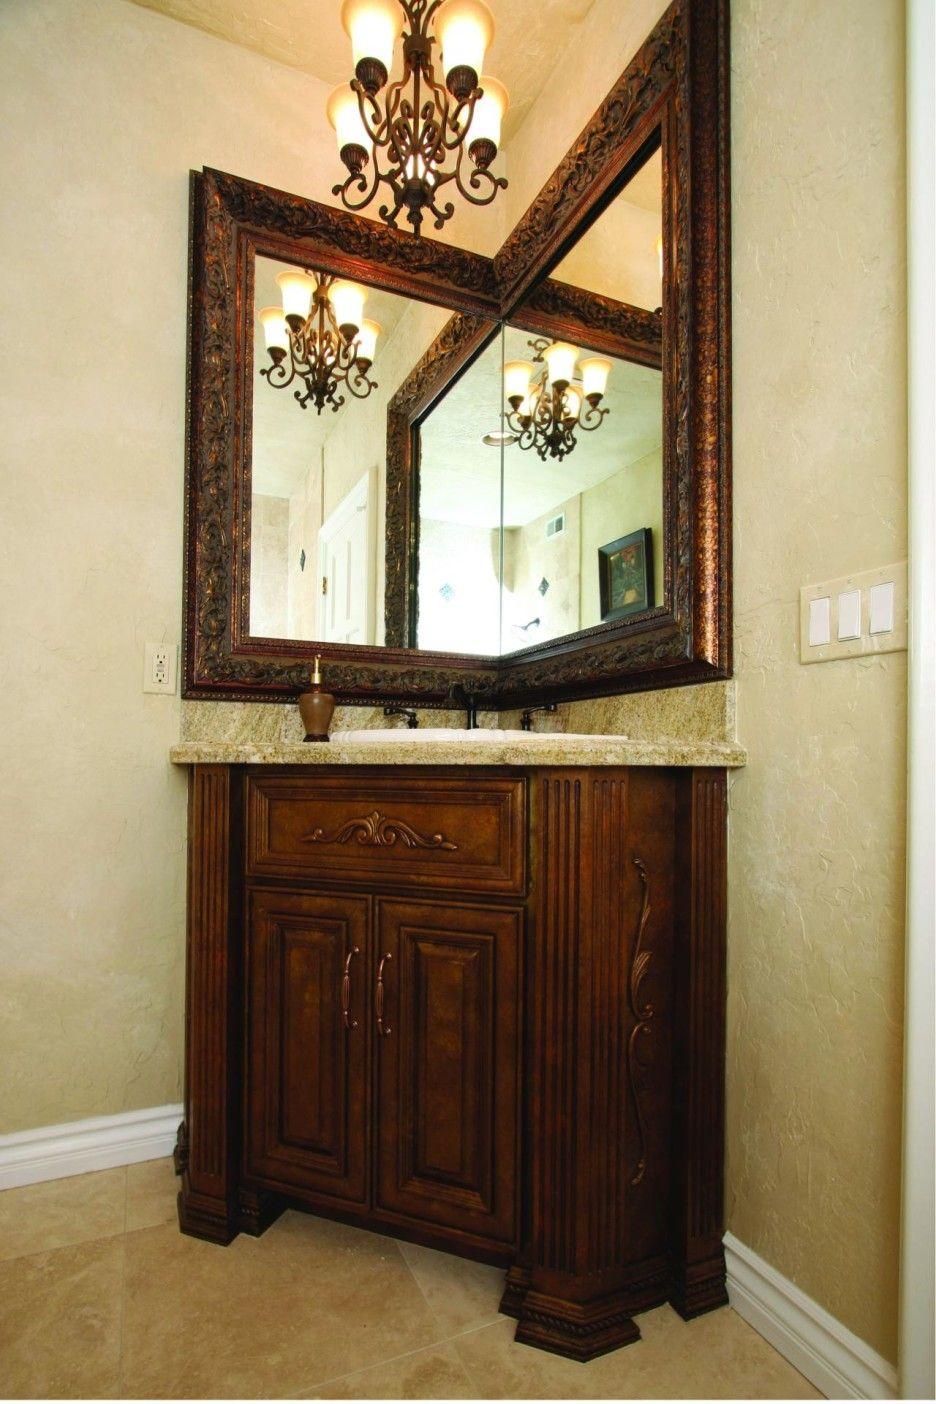 25 Diy Vanity Mirror Ideas With Lights Mab Corner Bathroom Mirror Corner Bathroom Vanity Corner Mirror